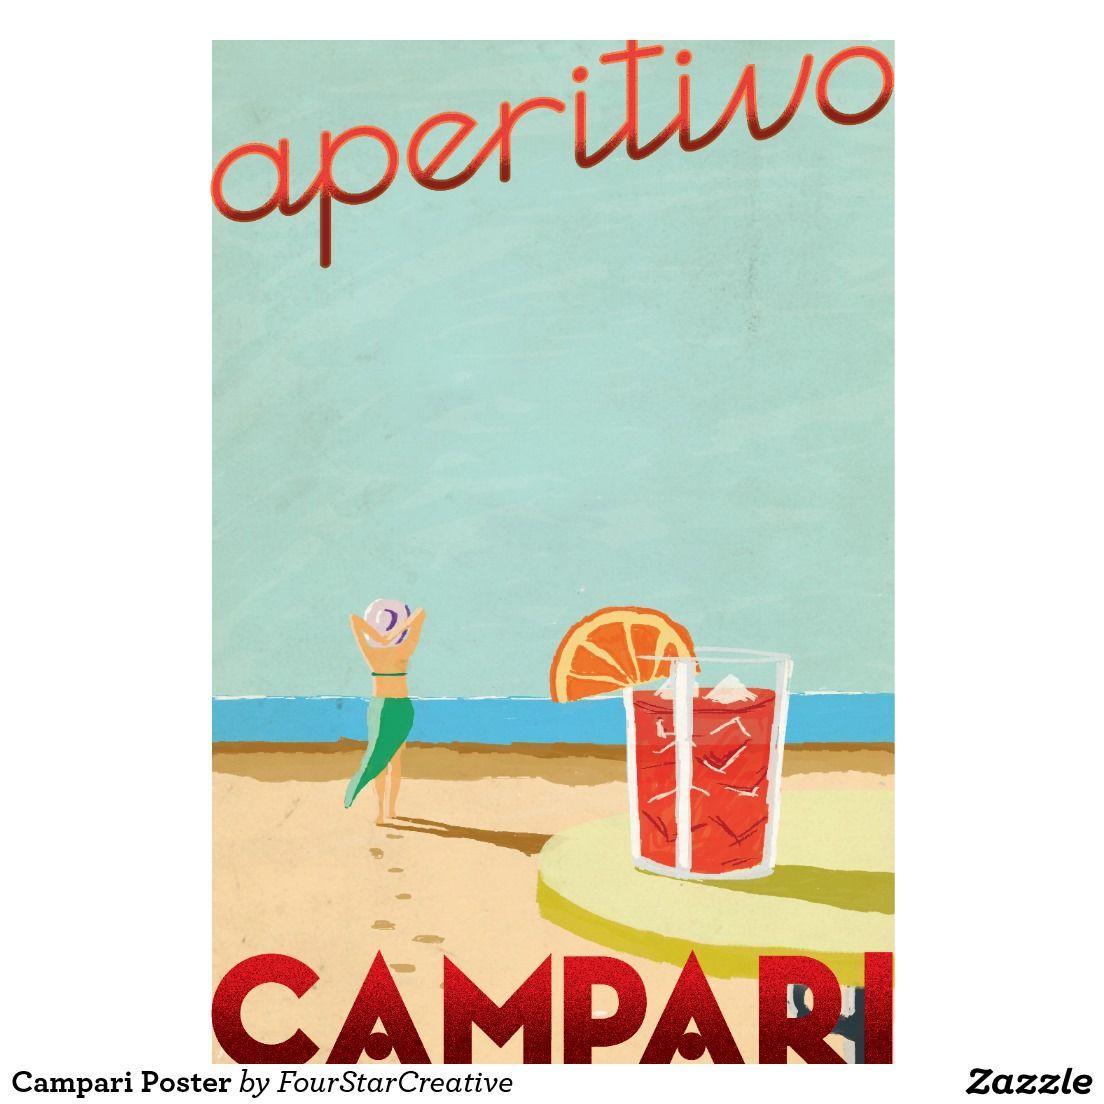 art deco campari - Google Search   Dining Room   Pinterest   Art deco